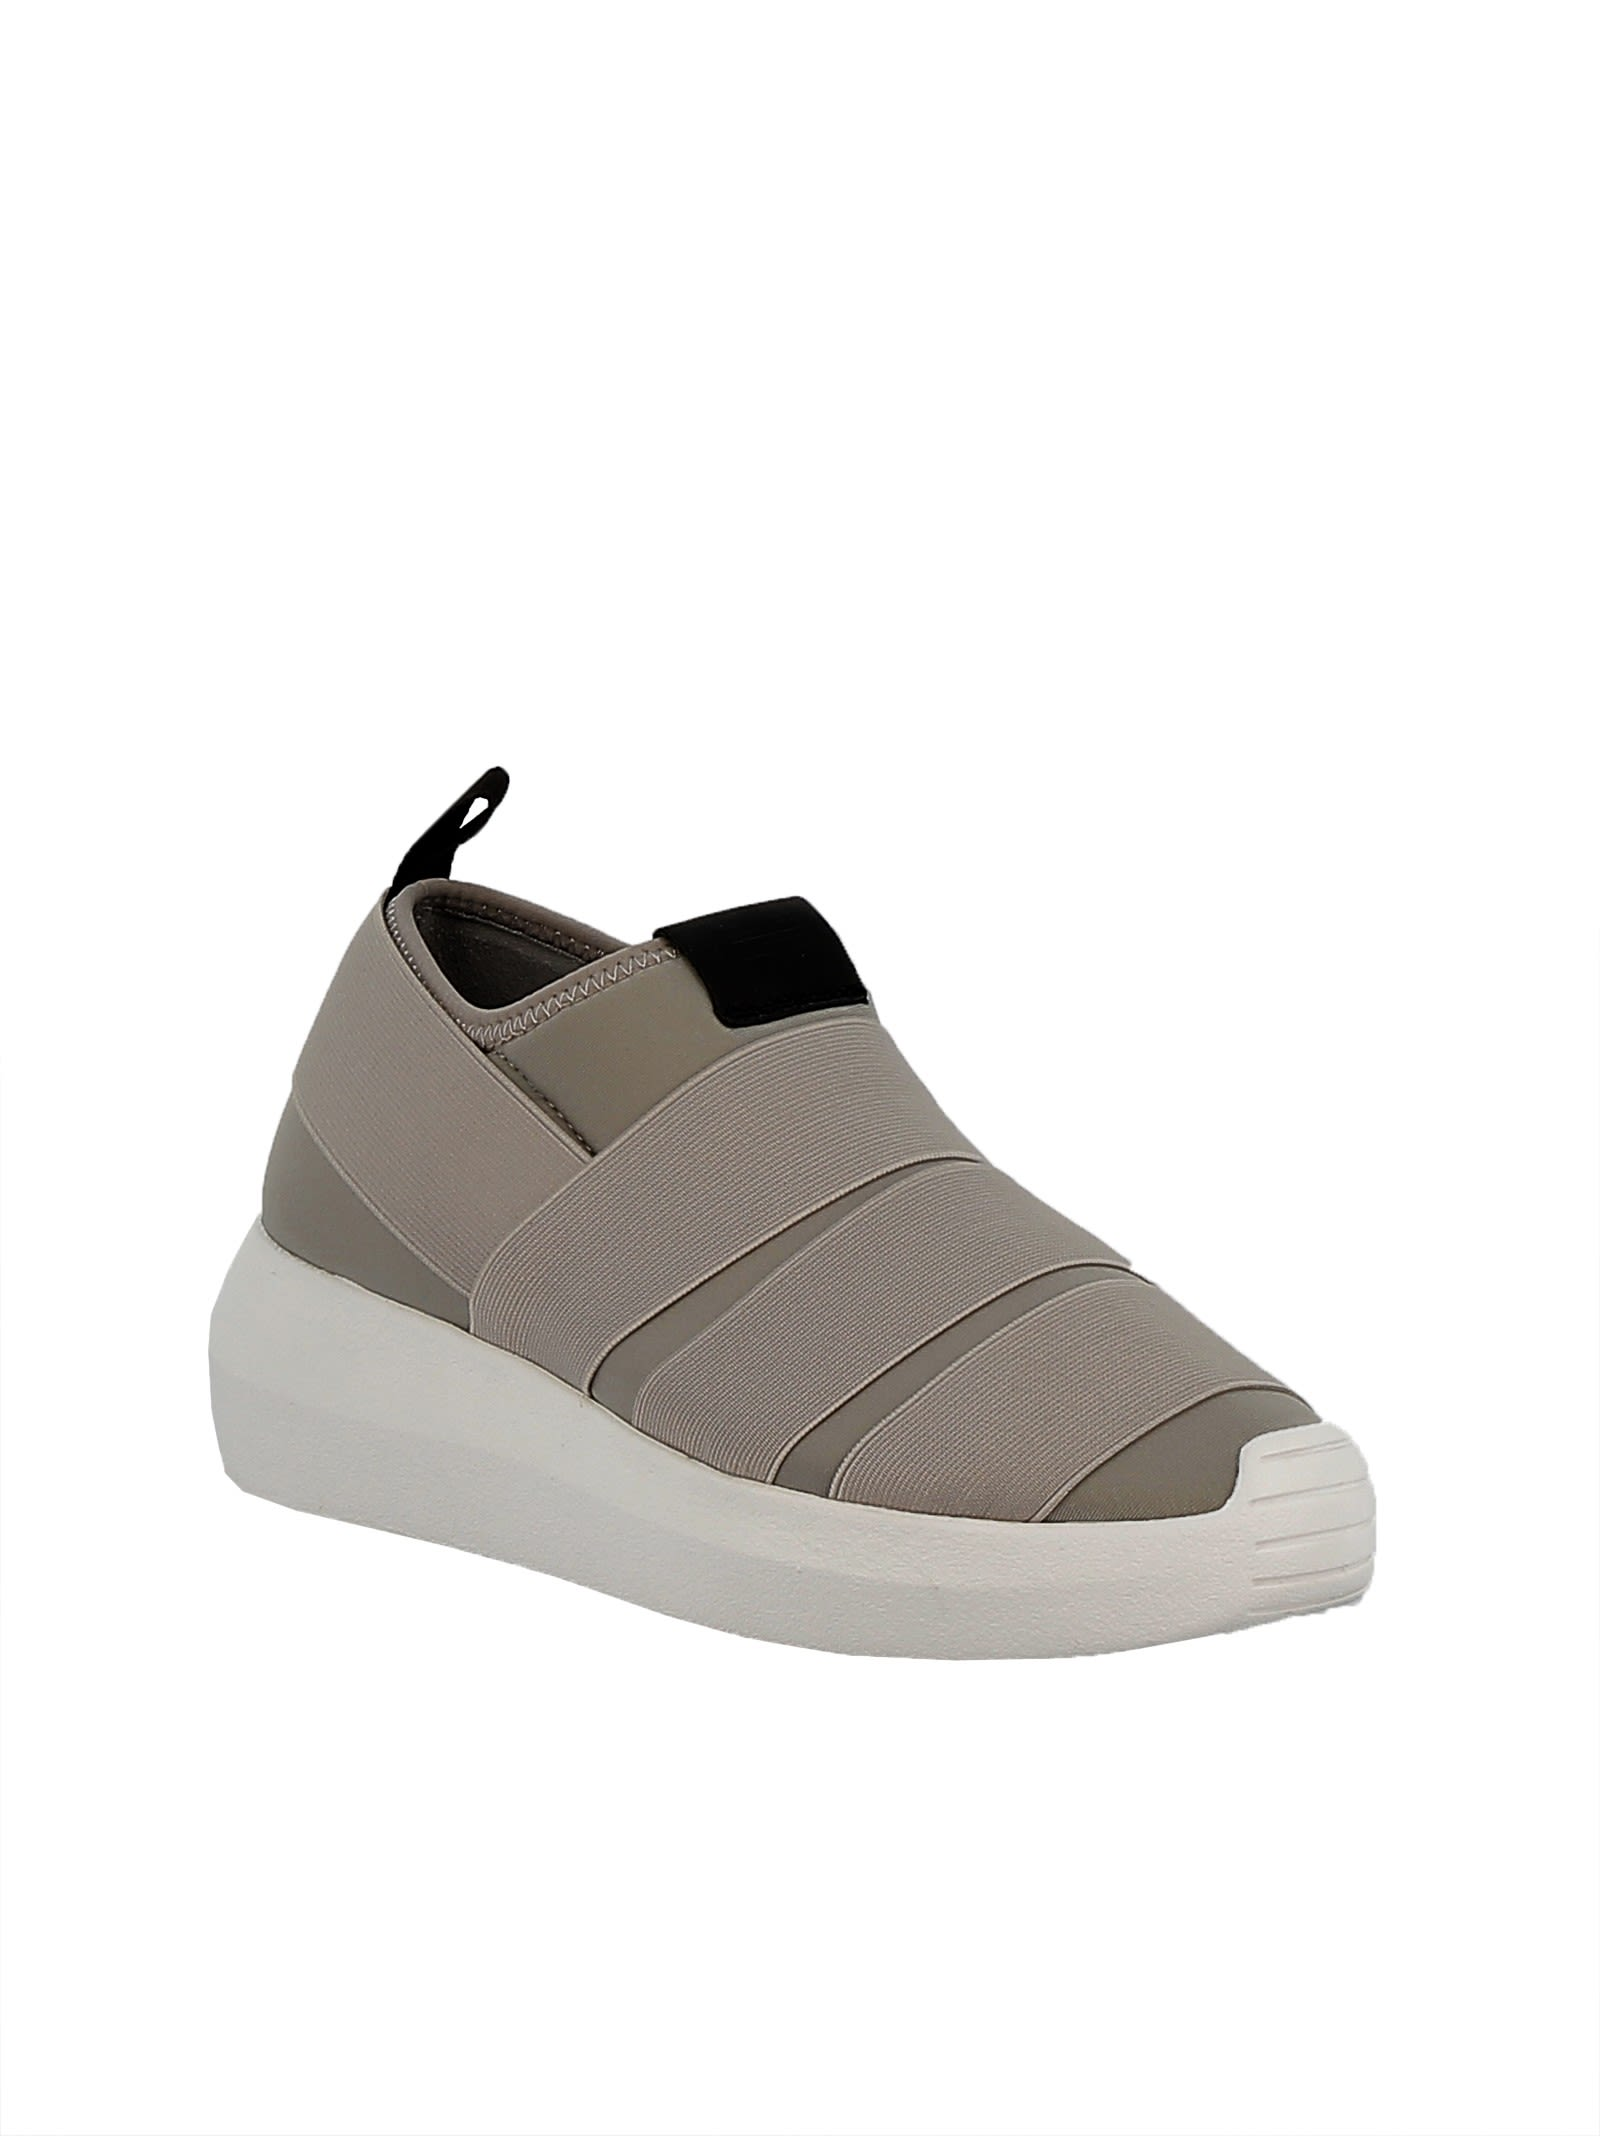 Chaussures De Tissu Gris qgfORhc15